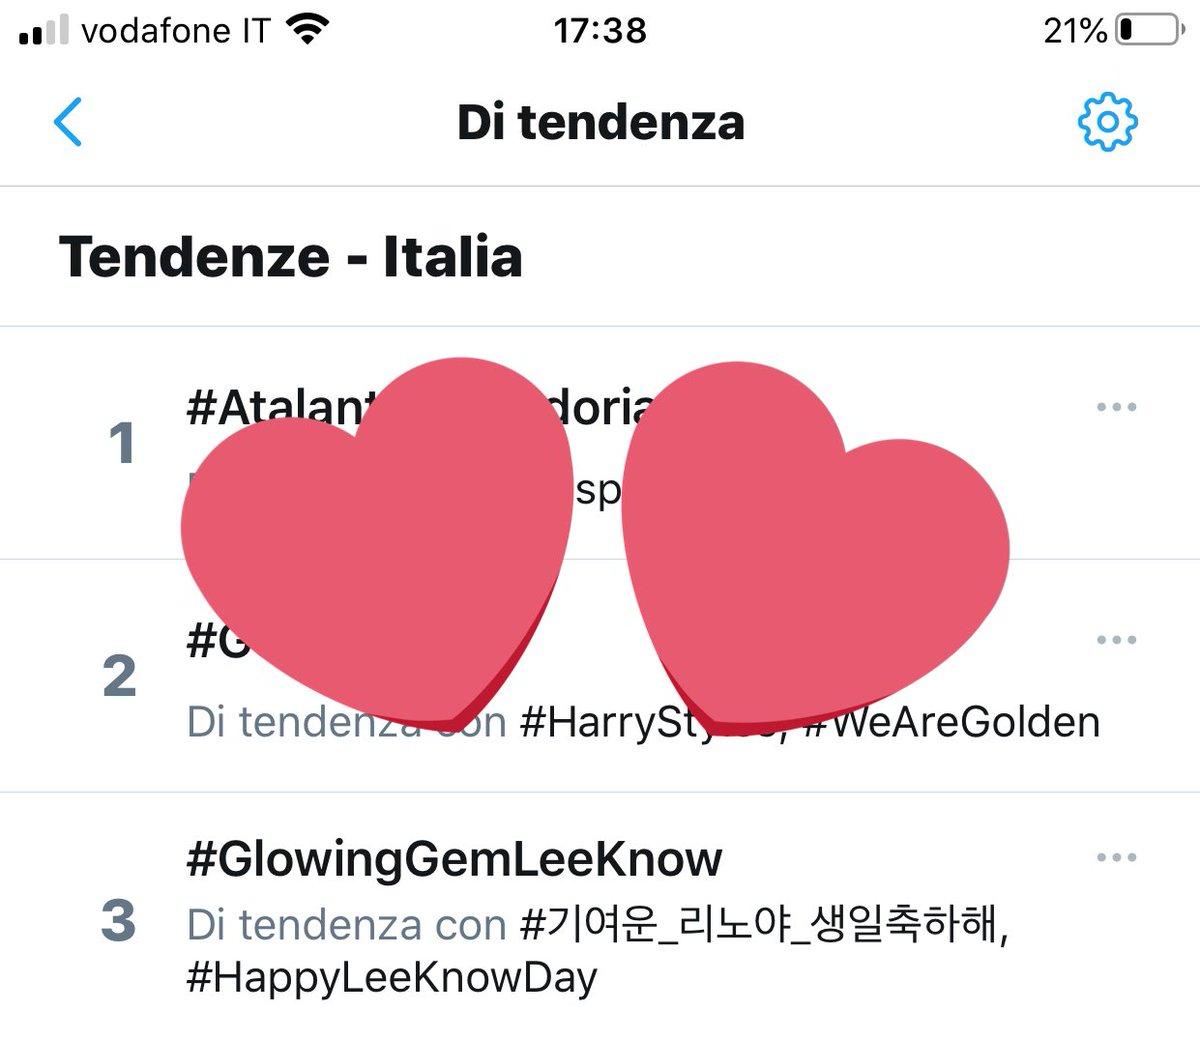 #GlowingGemLeeKnow